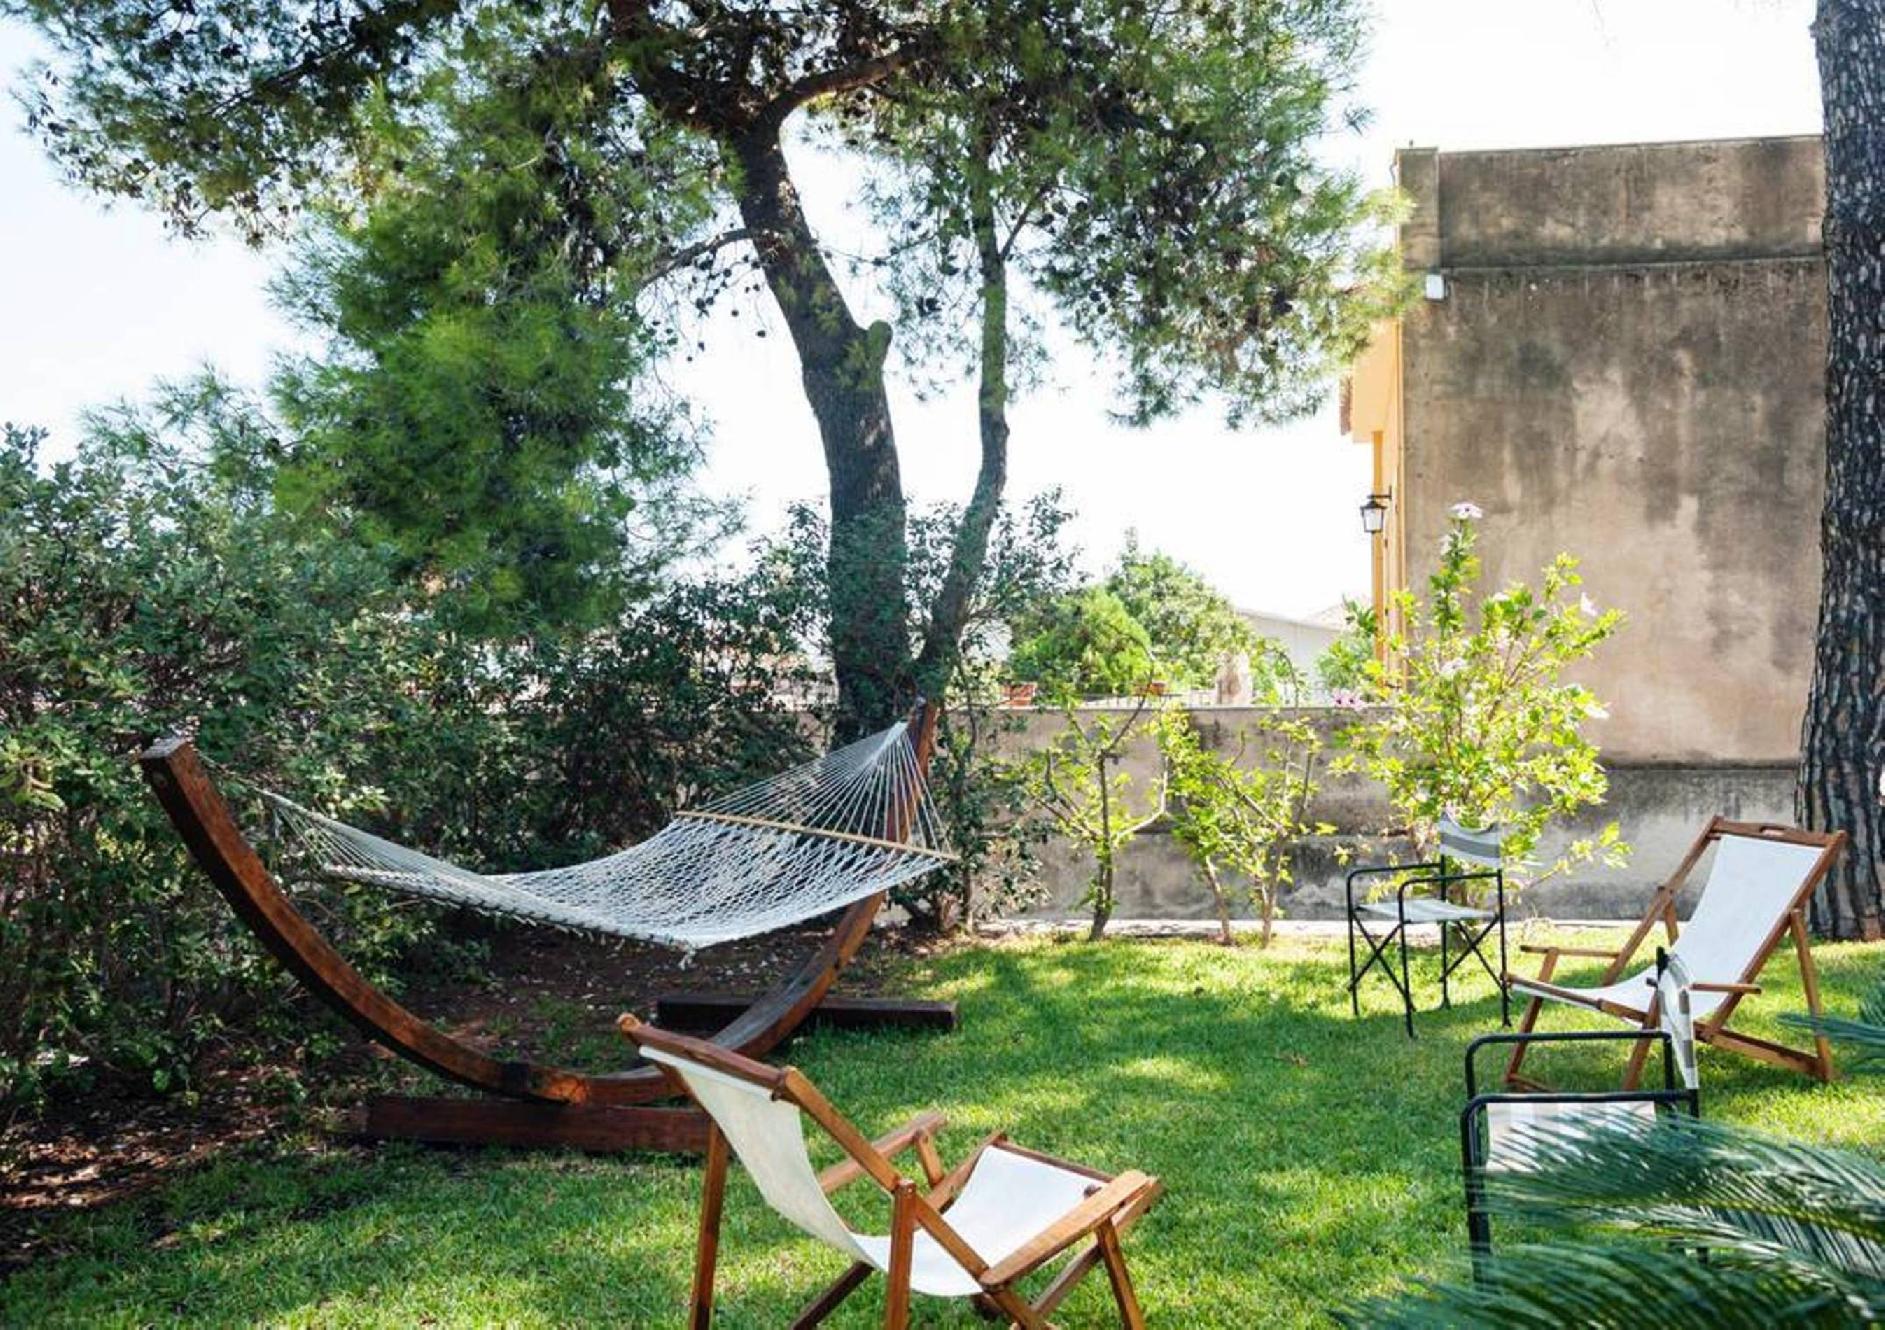 Apartment Villa with garden in Sicily near the sea   photo 31811561